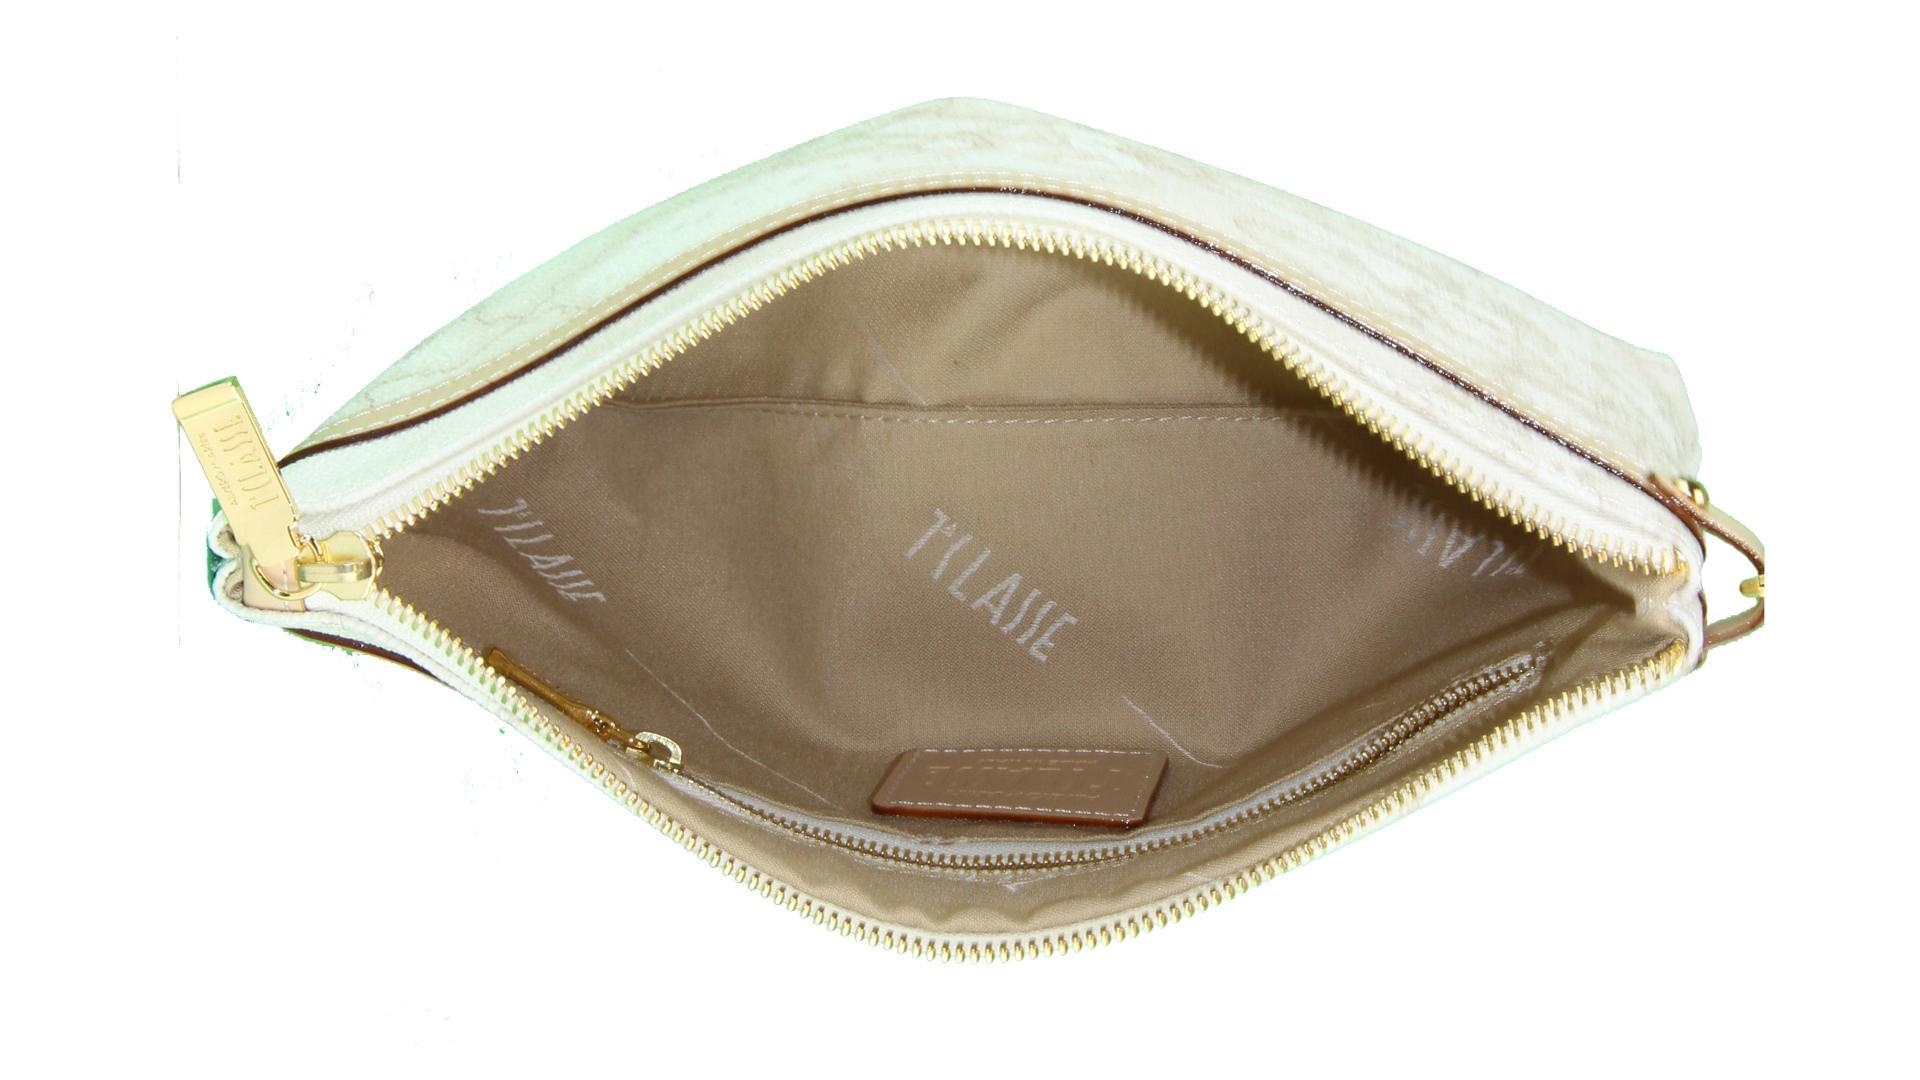 Hand bag Alviero Martini 1A Classe Contemporary N138 6188 900 Bianco